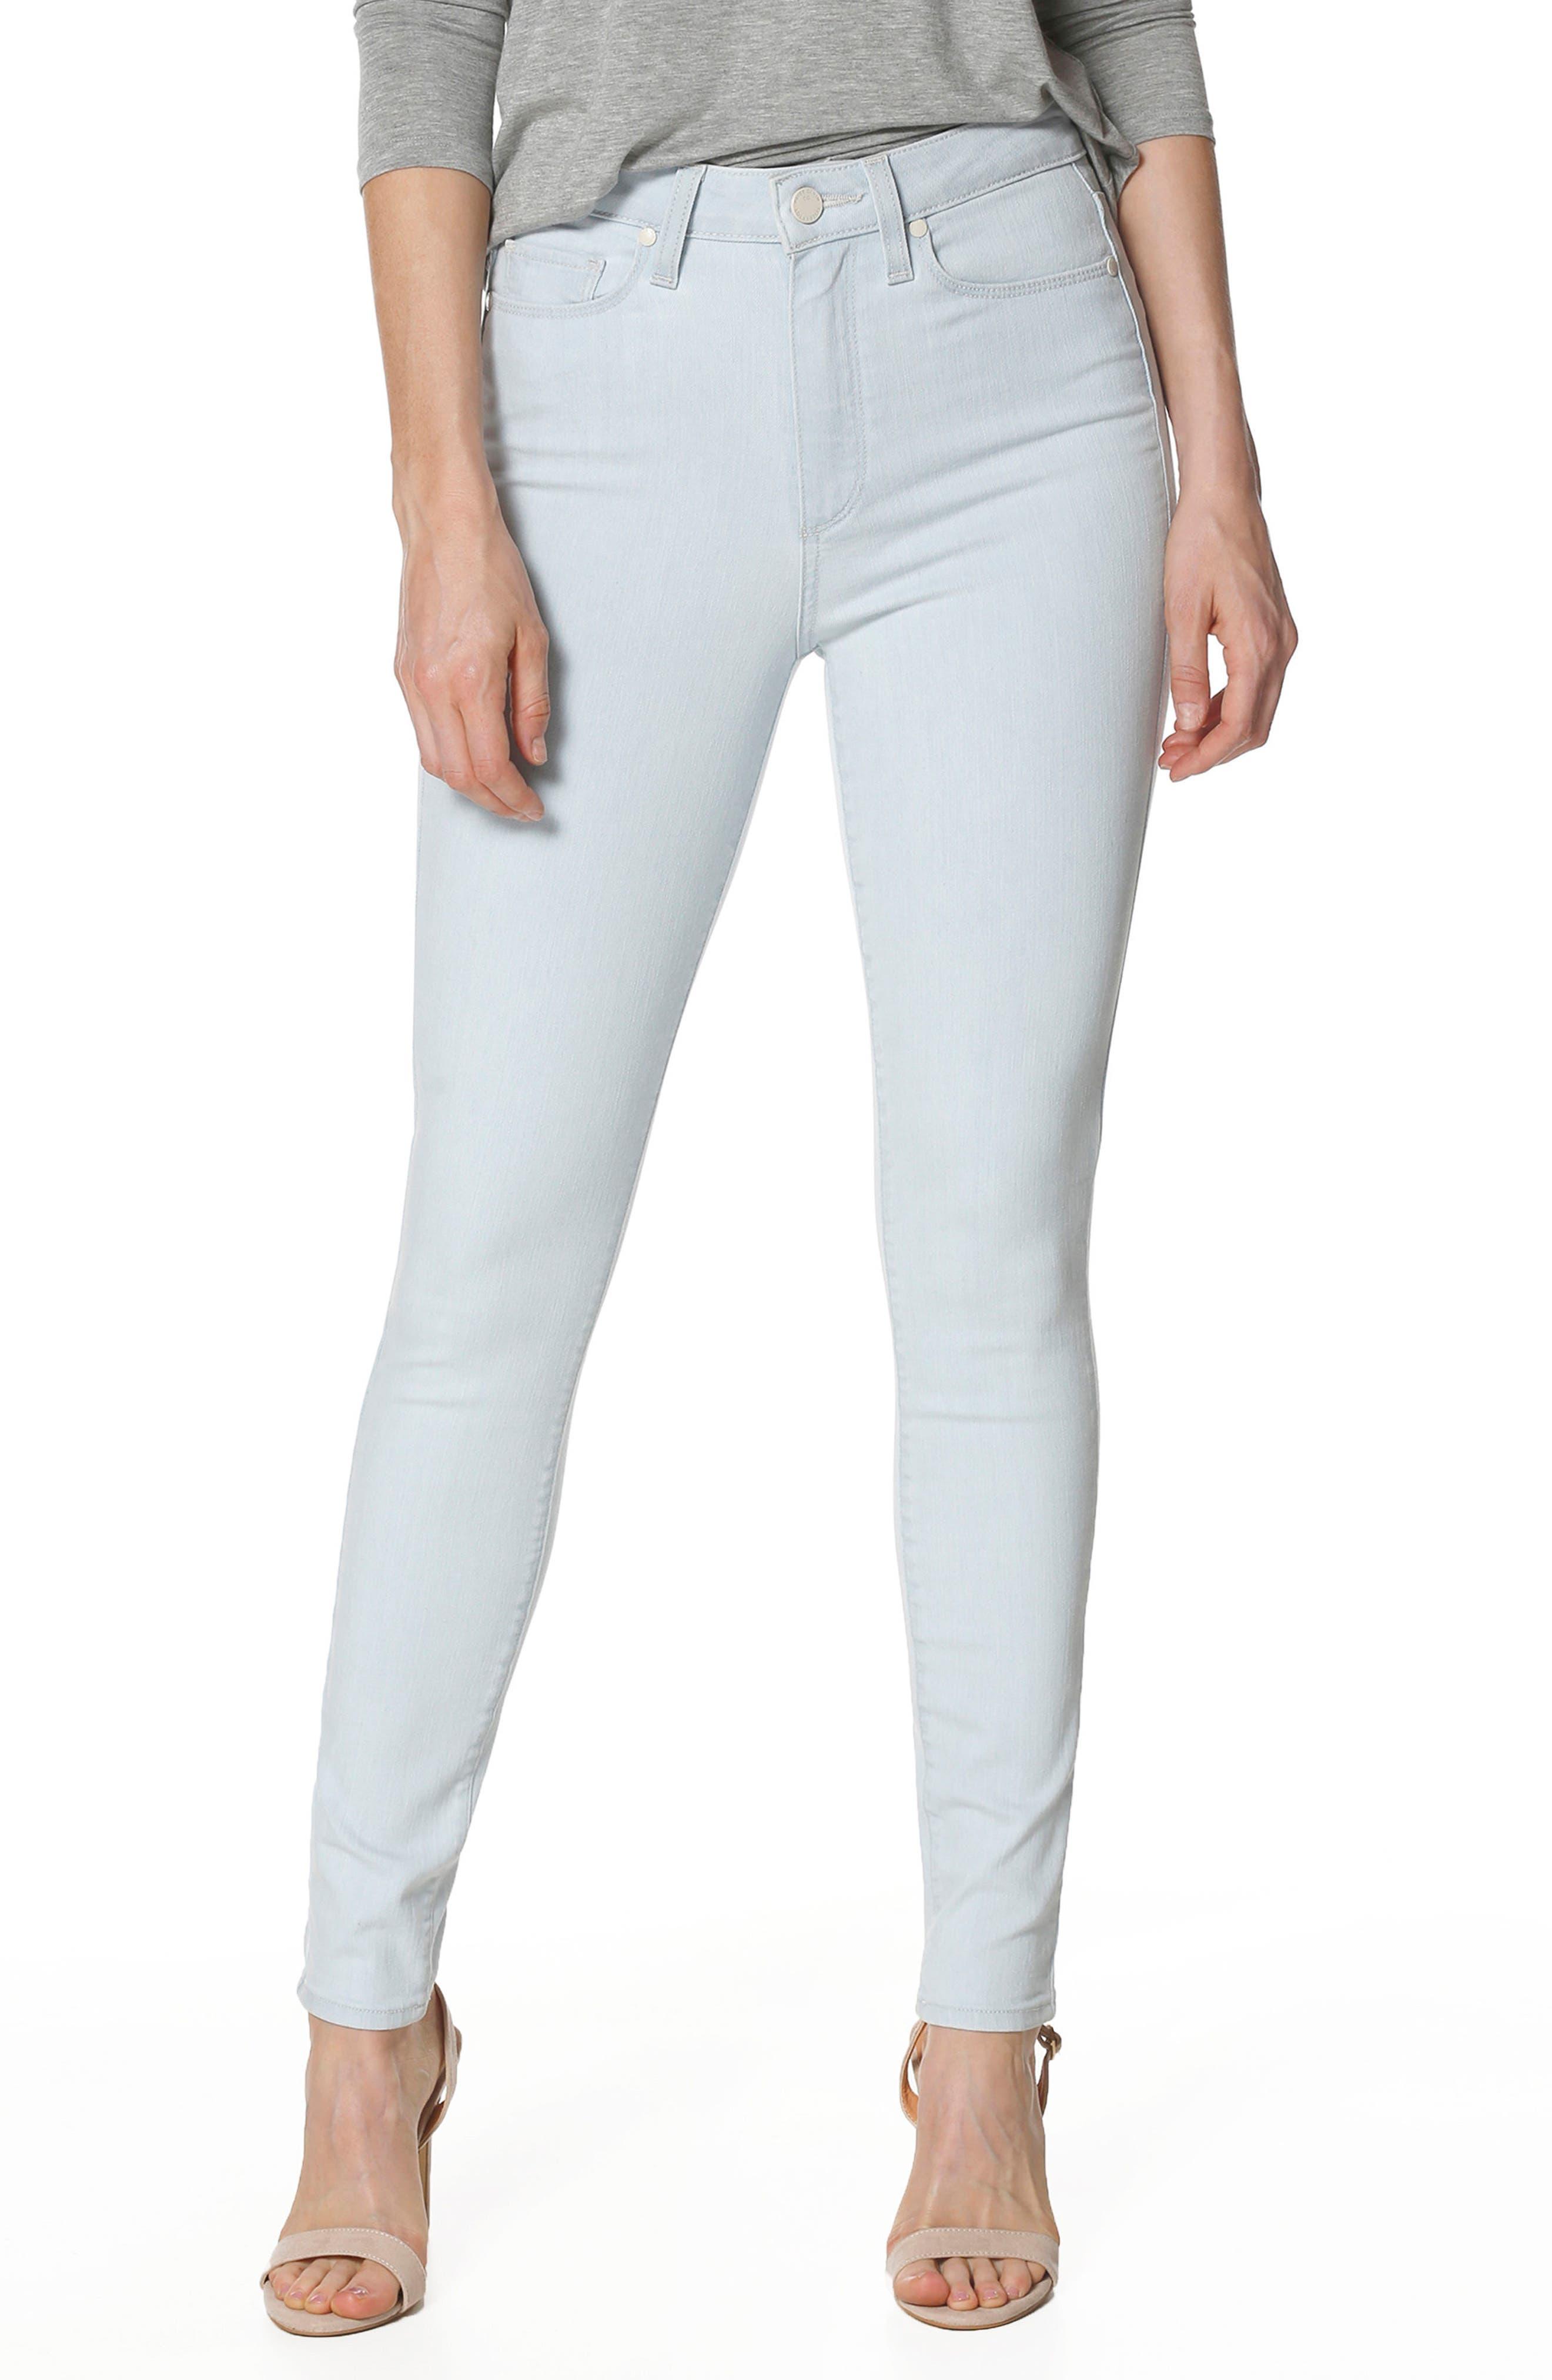 Margot High Waist Ultra Skinny Jeans,                             Main thumbnail 1, color,                             400